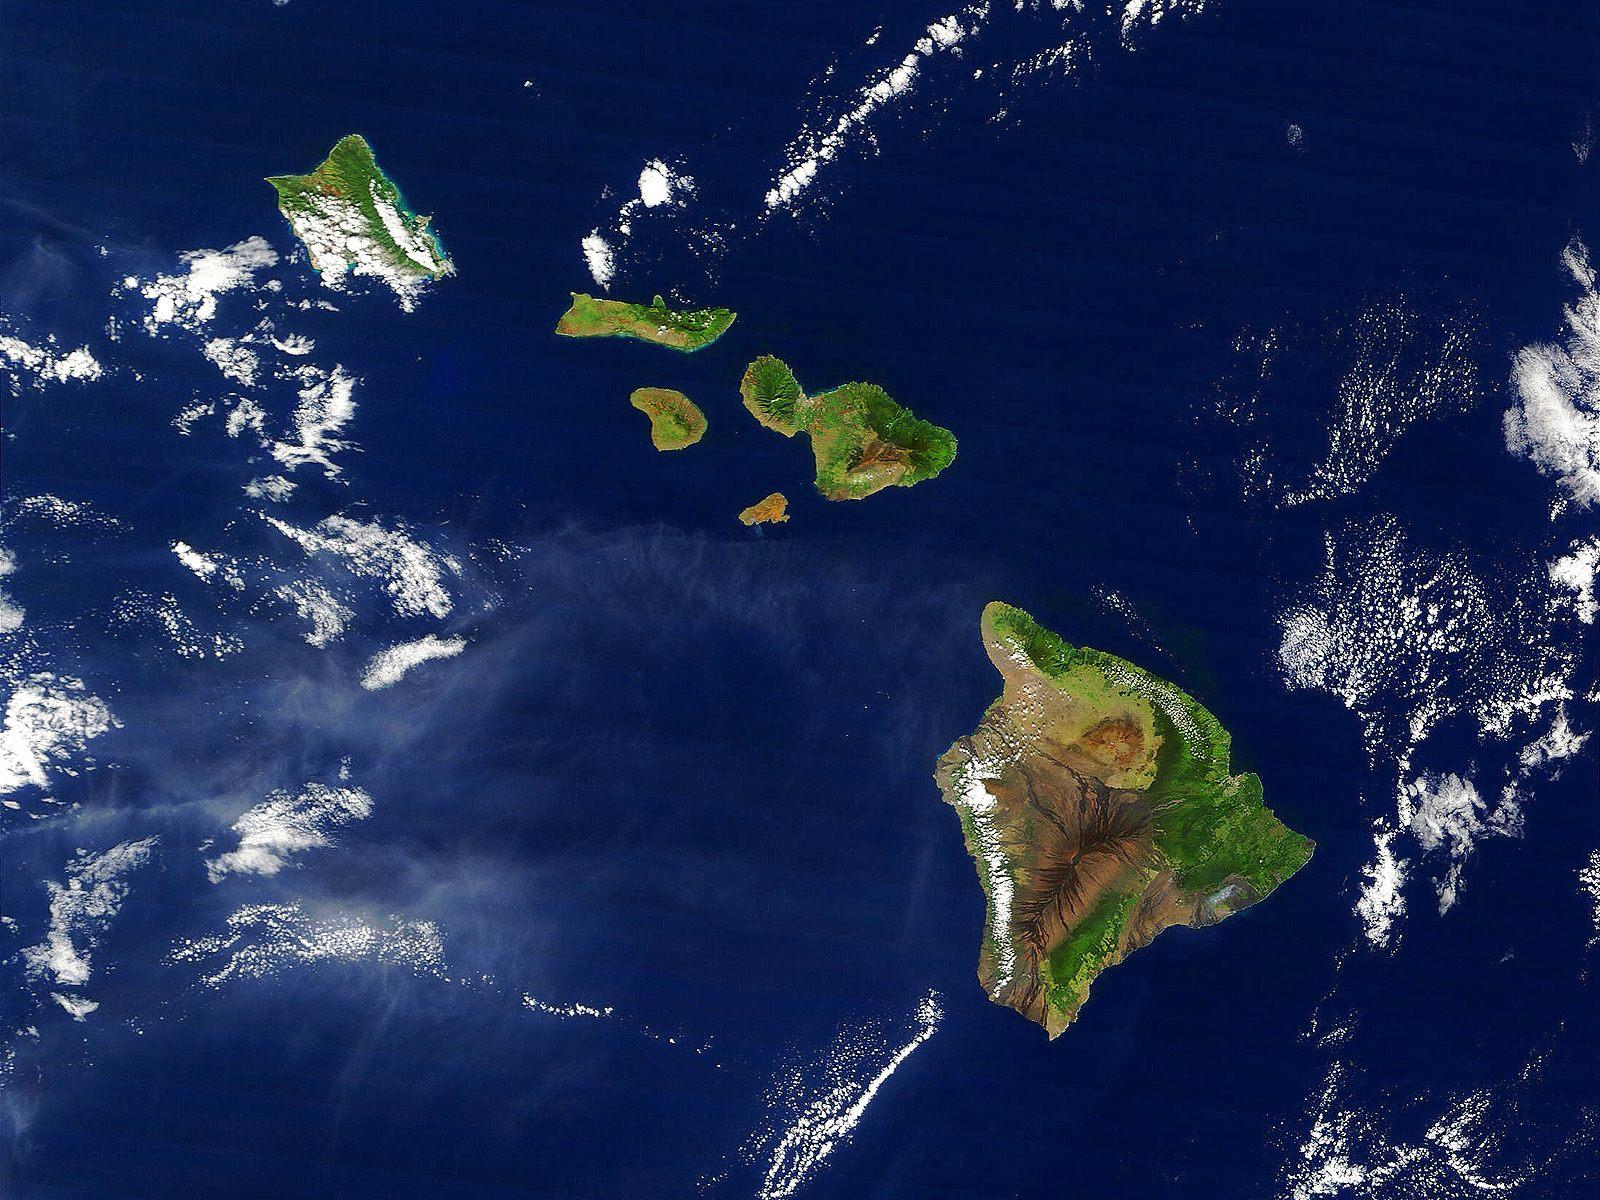 Hawaii images Satellite Image of the Hawaiian Islands wallpaper photos 1600x1200